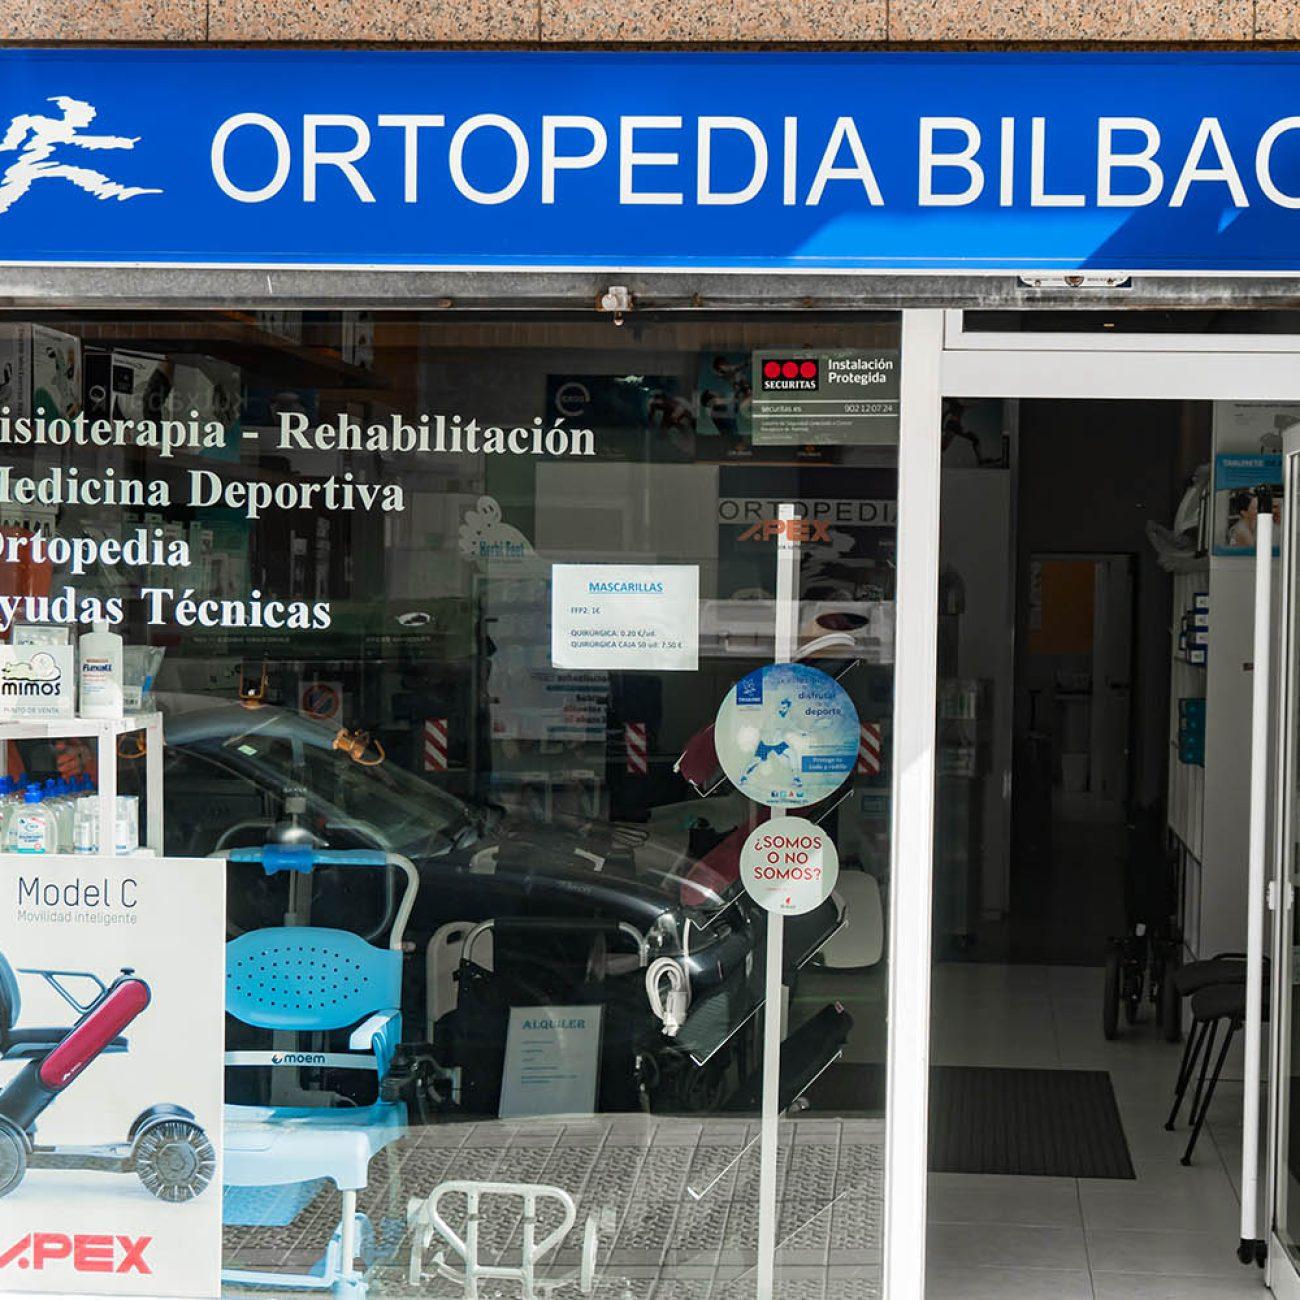 Ortopedia Bilbao